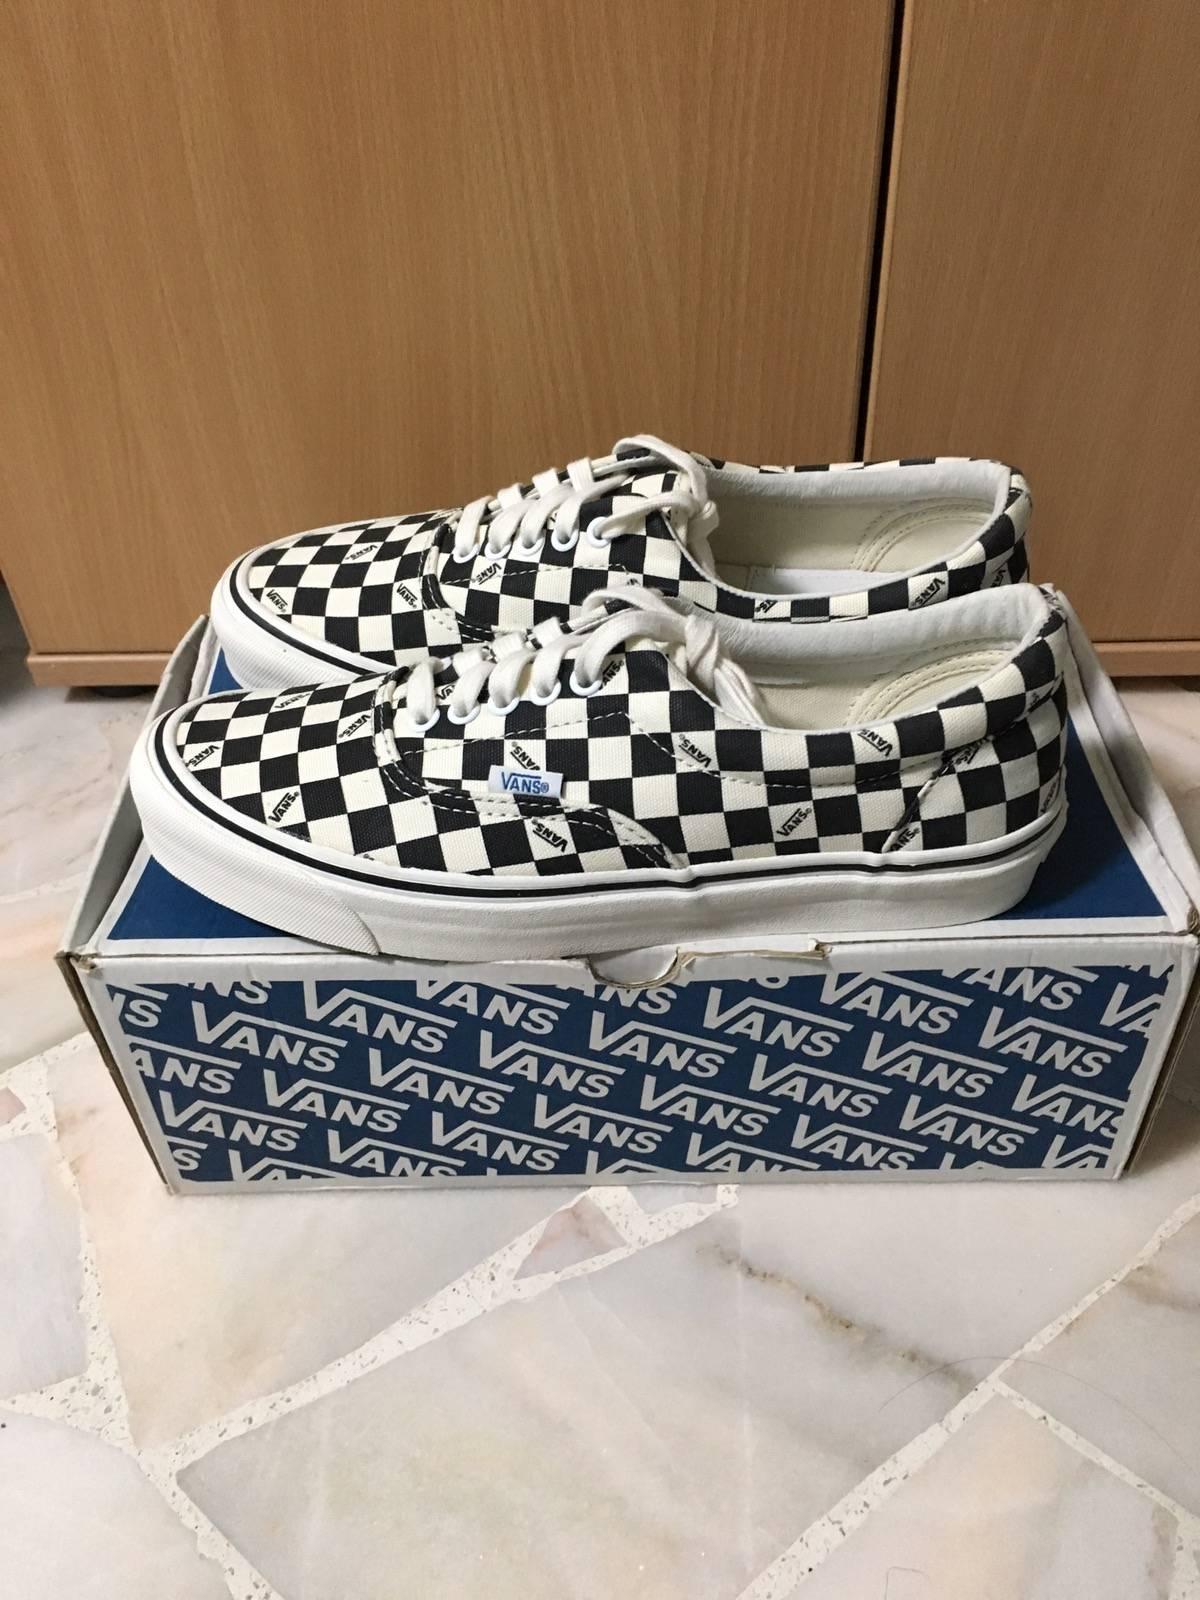 502e09cfbf Vans Vans Vault Lx Og Checkerboard Era US9 Fog Fear Of God Size 9 - Low-Top  Sneakers for Sale - Grailed